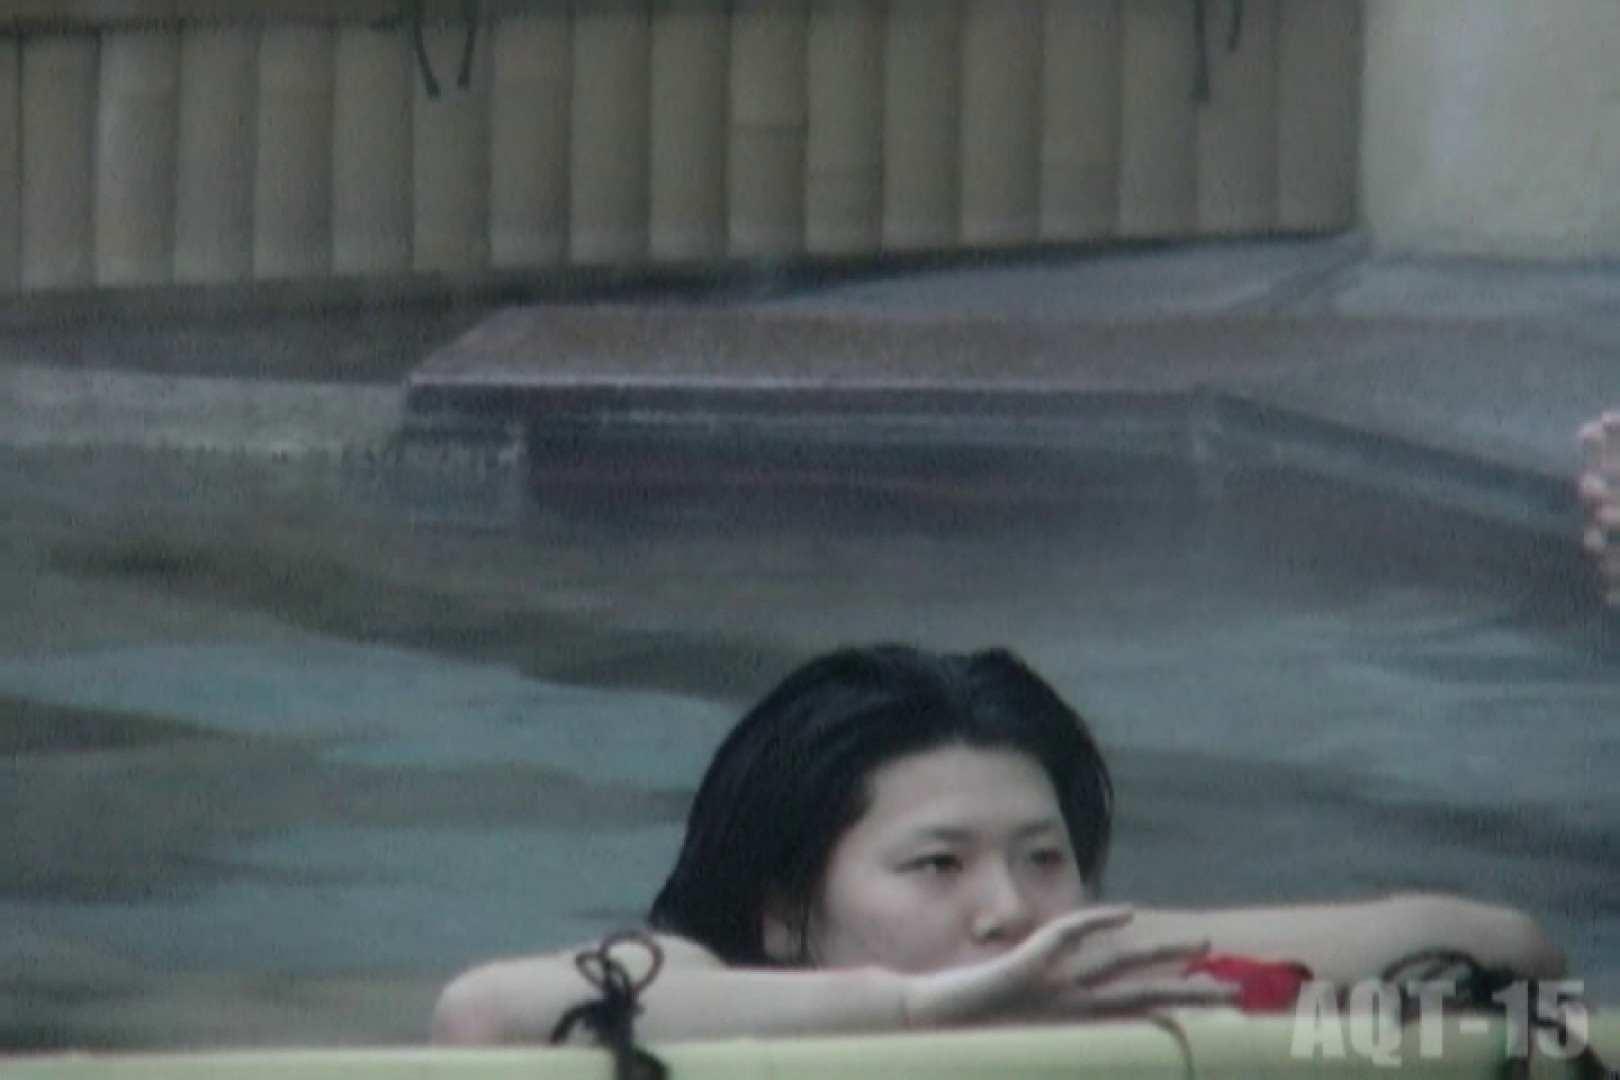 Aquaな露天風呂Vol.837 露天風呂突入 | 盗撮師作品  100pic 58